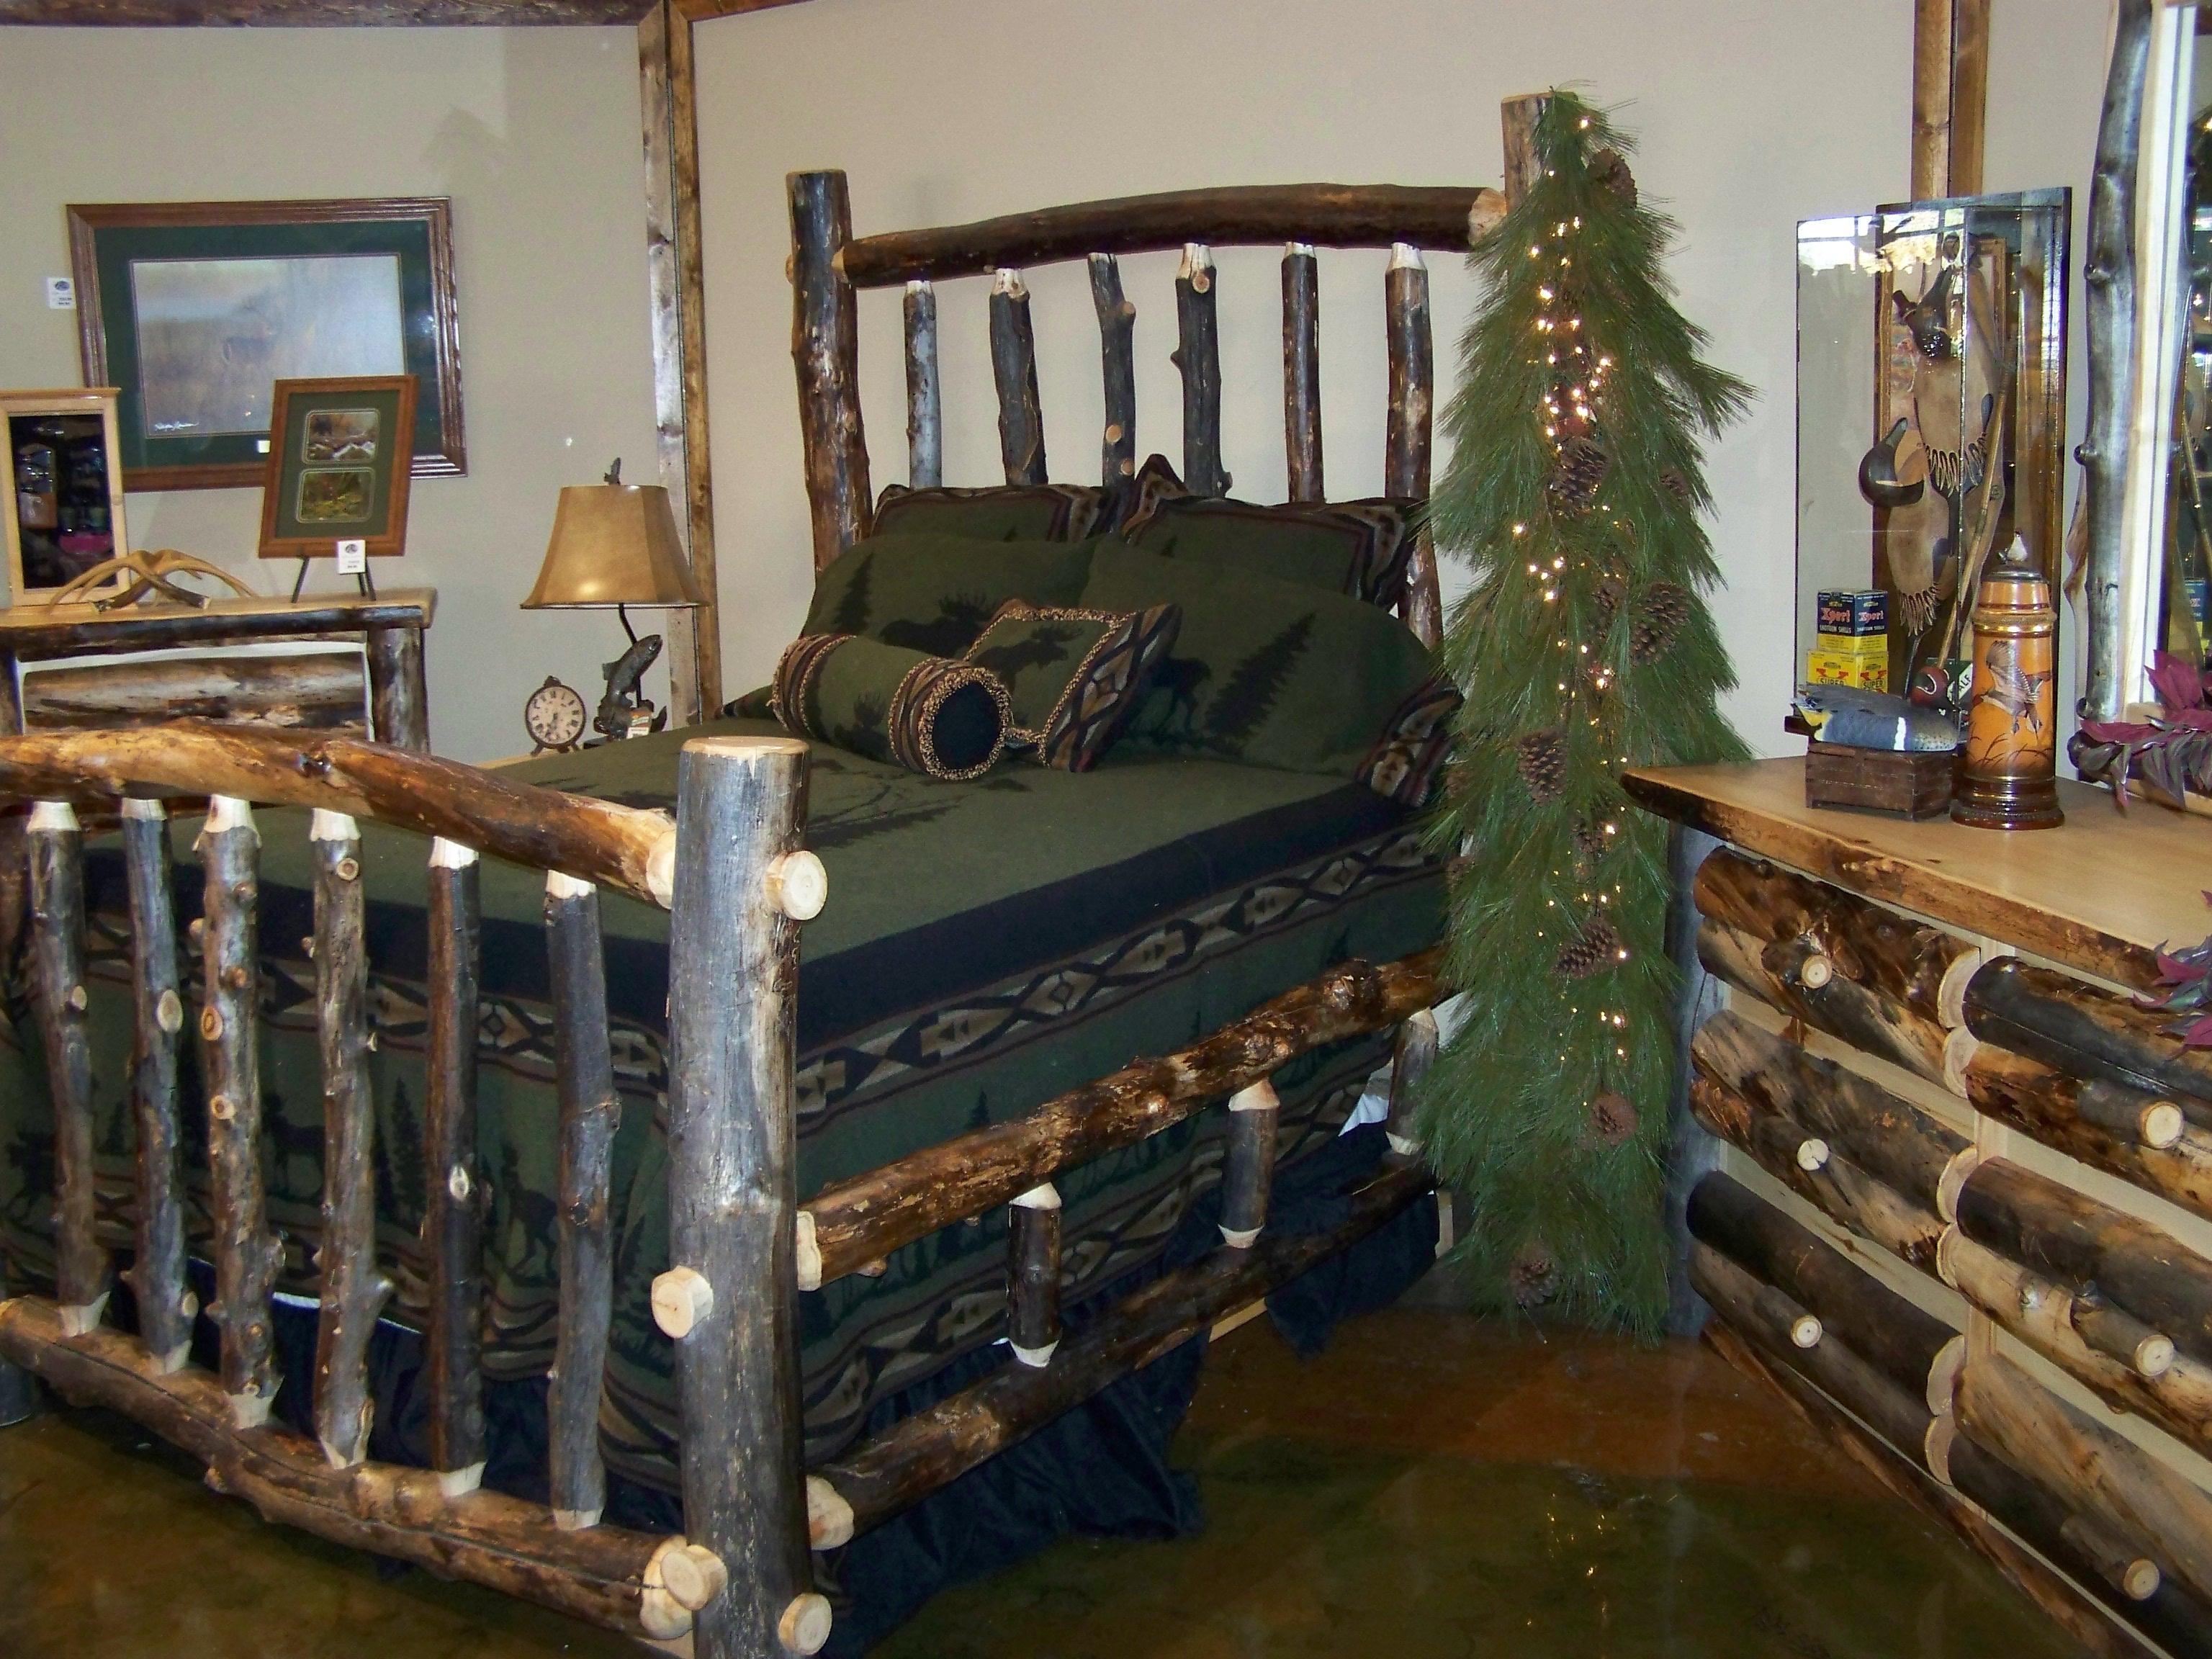 wallpaper stores in springfield mo wallpapersafari. Black Bedroom Furniture Sets. Home Design Ideas